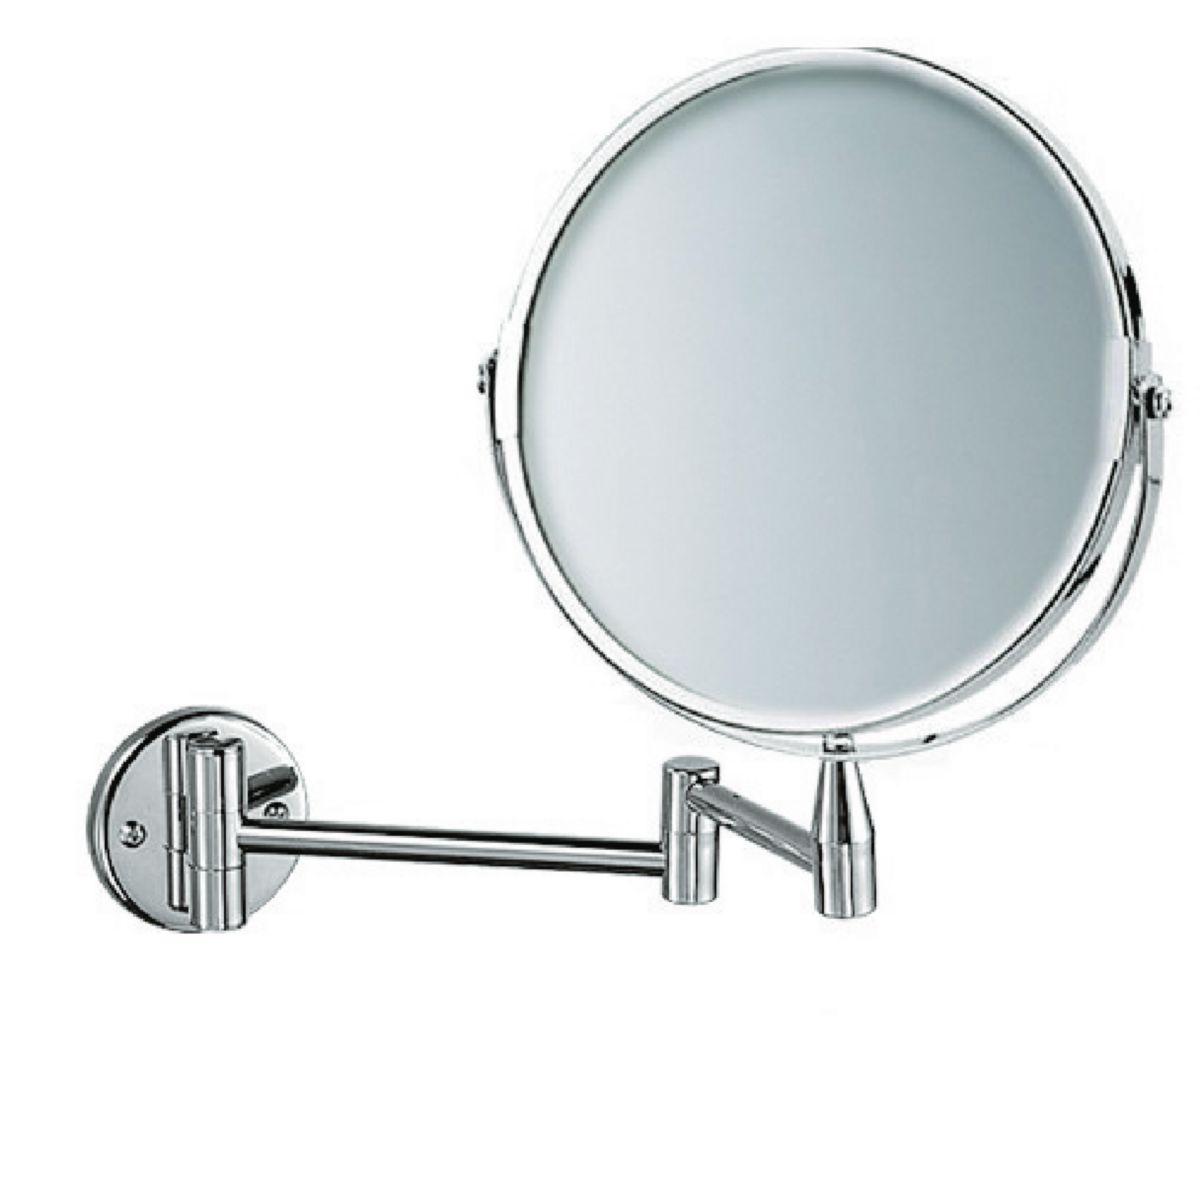 Miroir FELICIA diamètre 170 75 x 230 x 310 réf. P056008